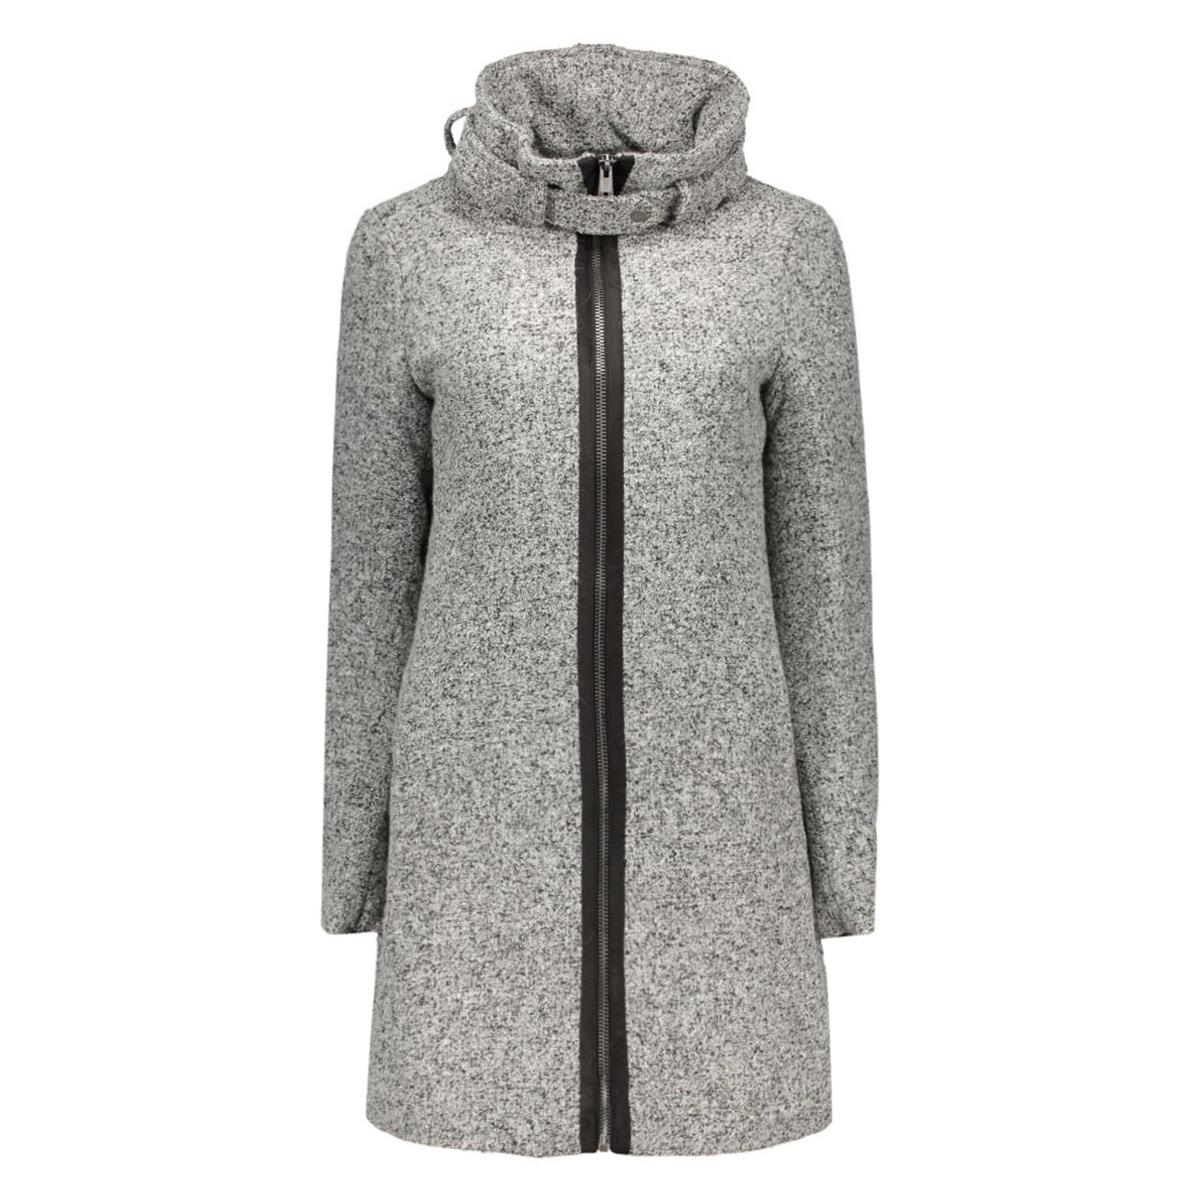 objnomi bella coat 86 23022689 object jas black